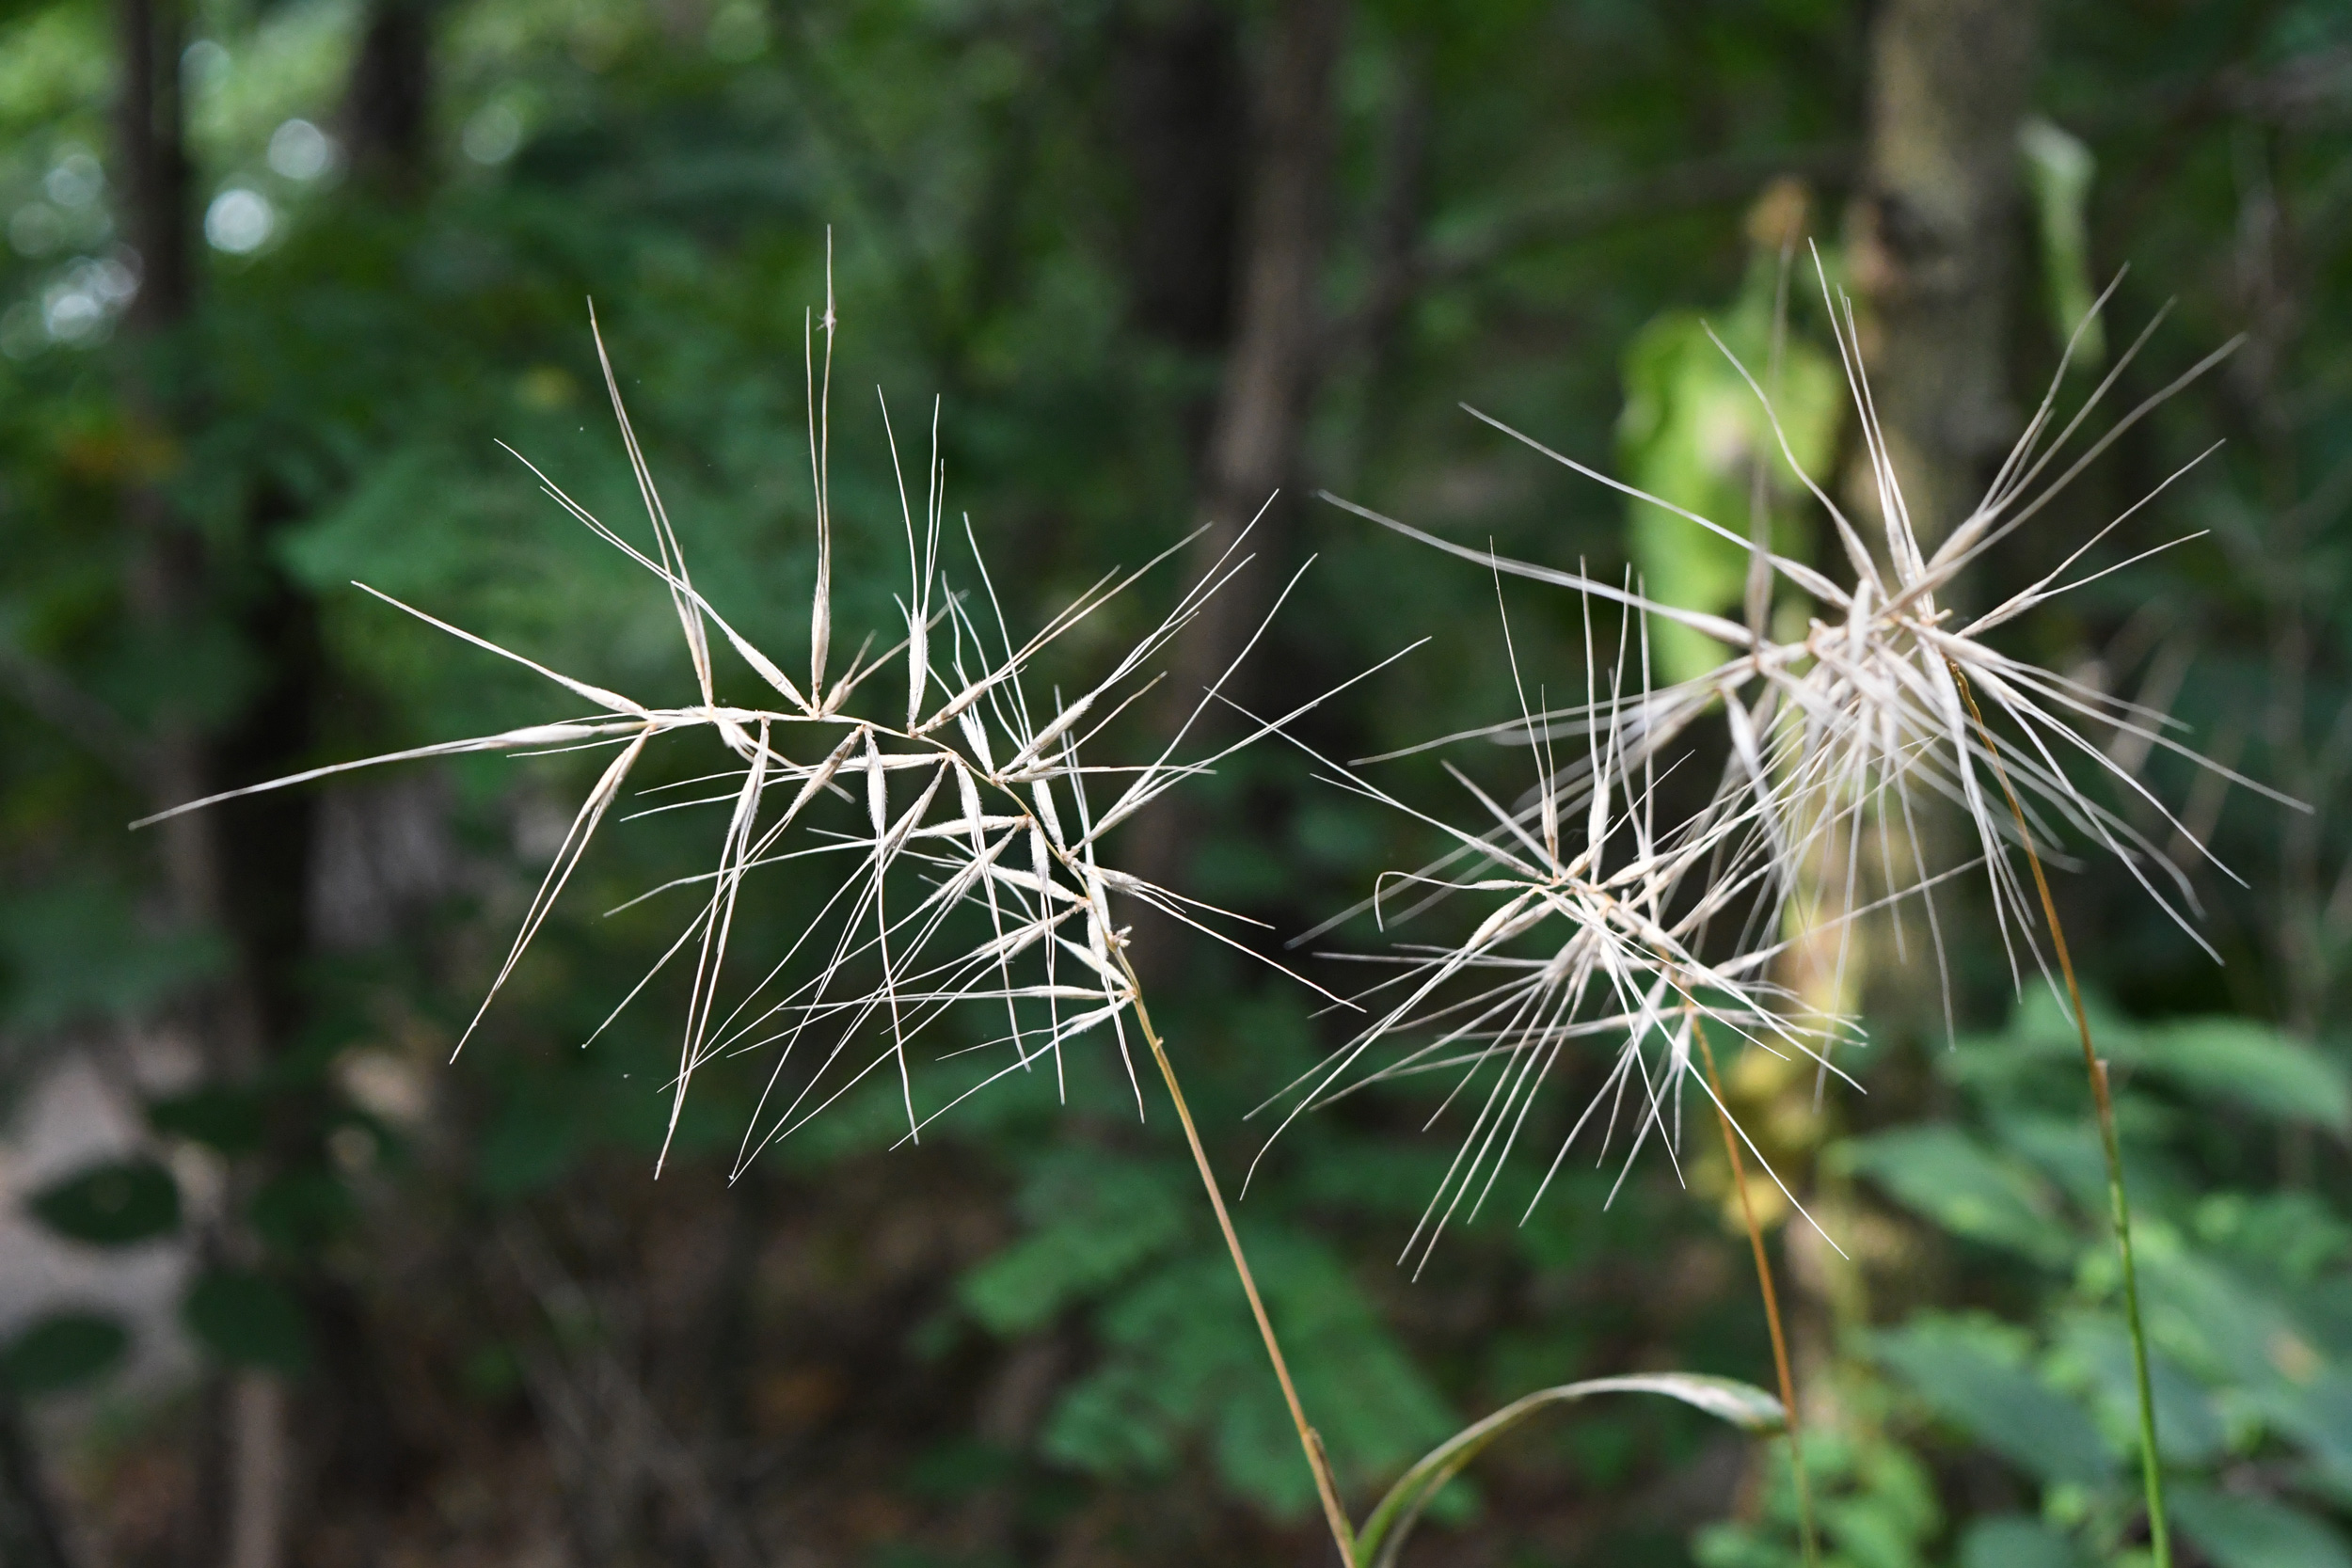 Dry grass seeds, Prospect Park